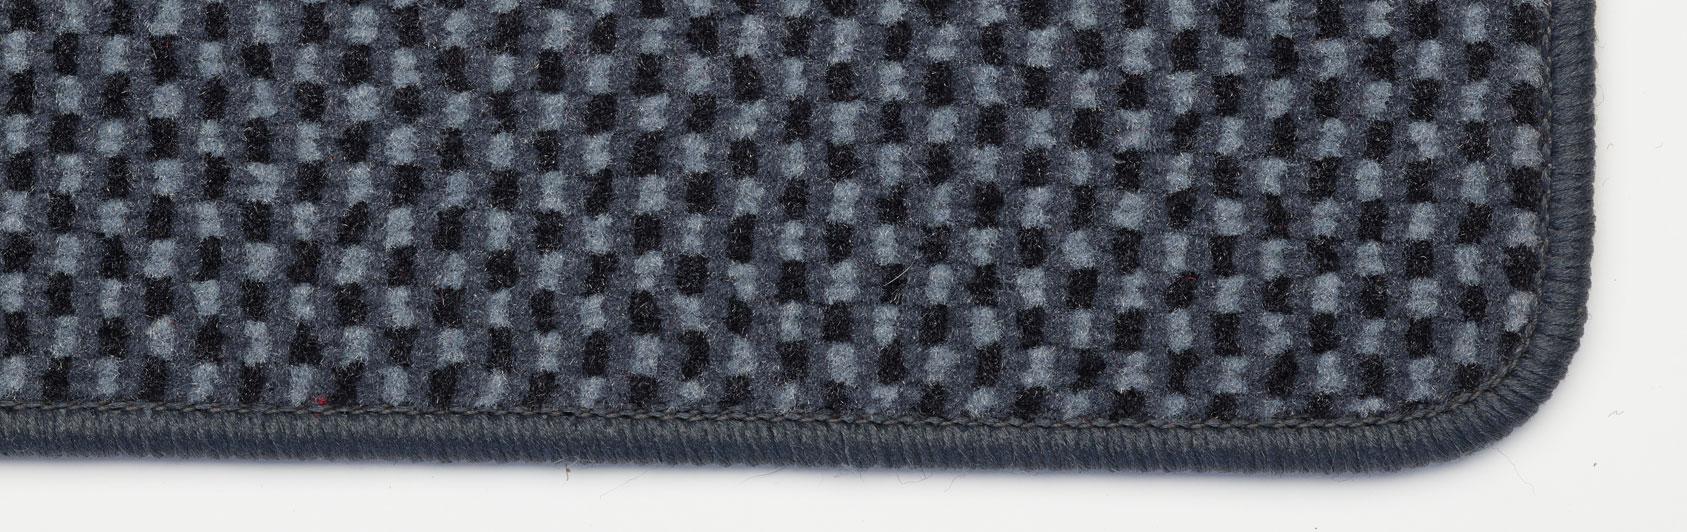 dirt trapper carpet robusta color gray color code 950